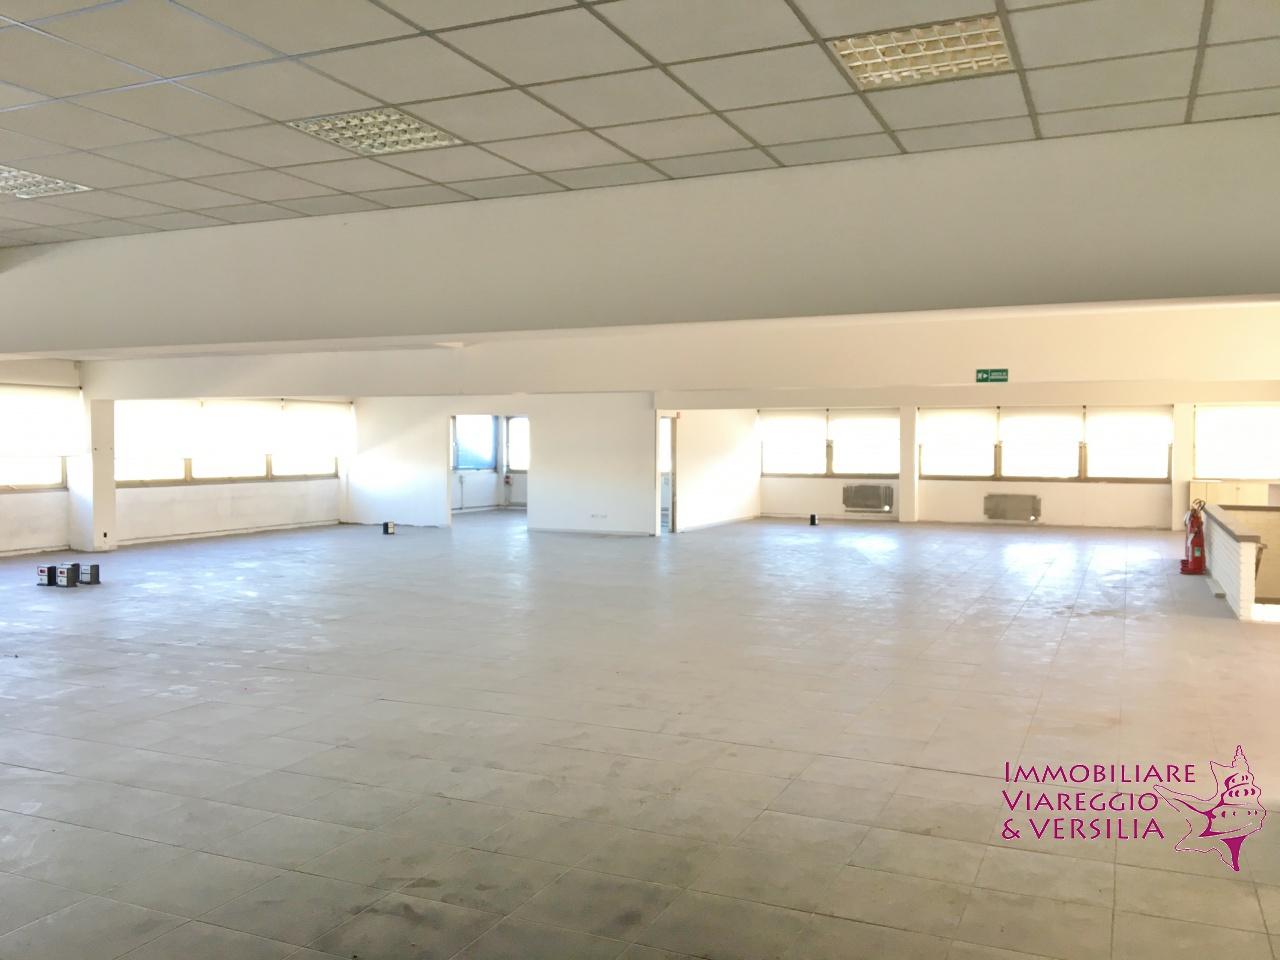 Capannone 5 locali in affitto a Massarosa (LU)